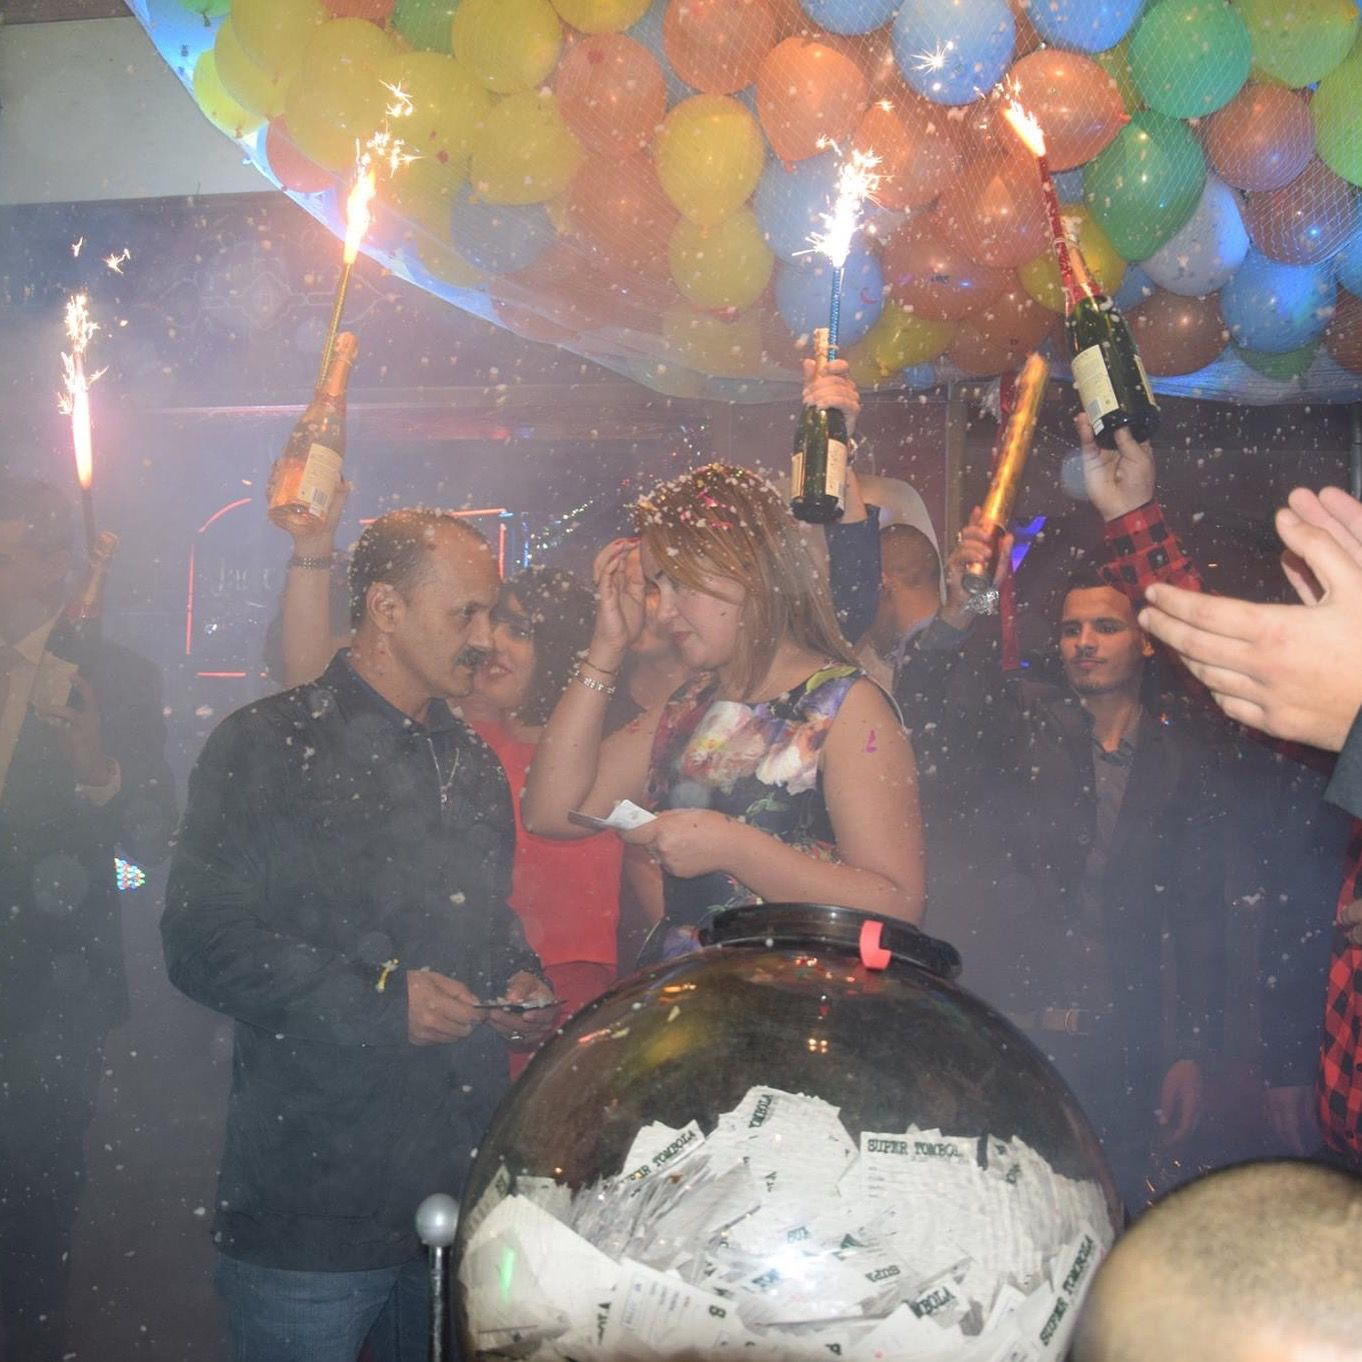 #tirageausort #celebratingistobelike #partyallnight #comeandwin